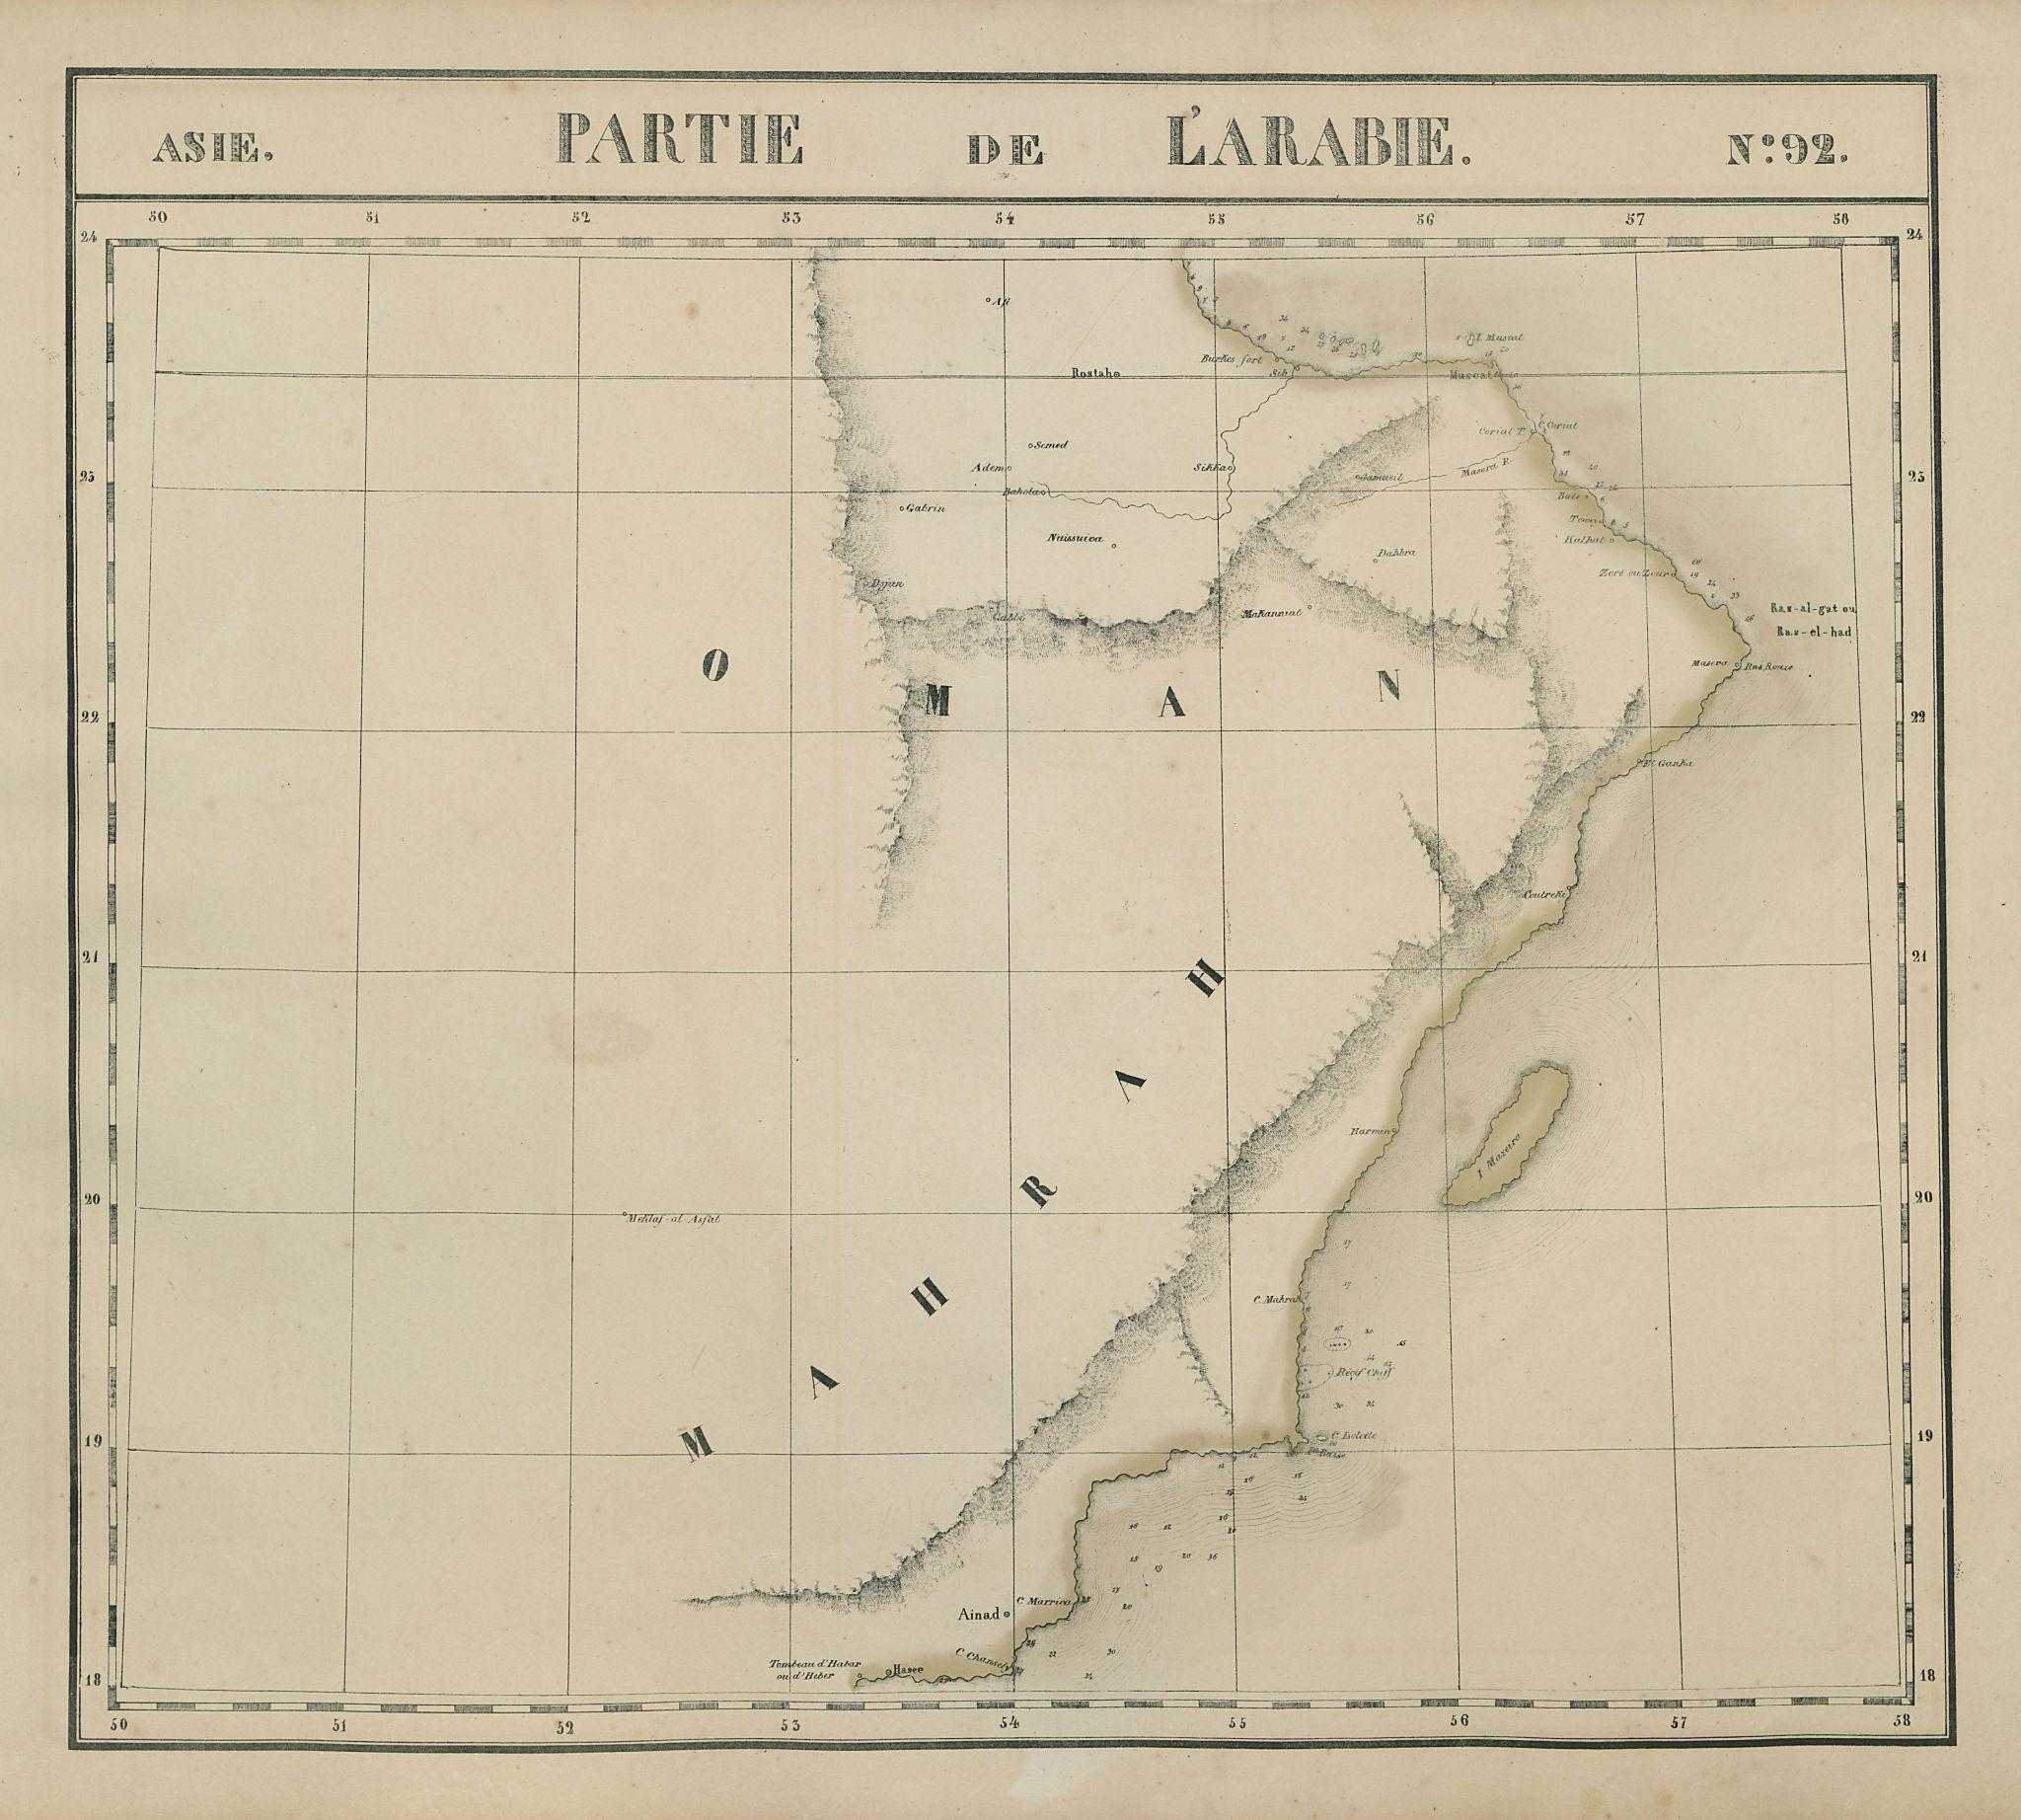 Asie. Partie de l'Arabie #92 Oman & SE Saudi Arabia VANDERMAELEN 1827 old map